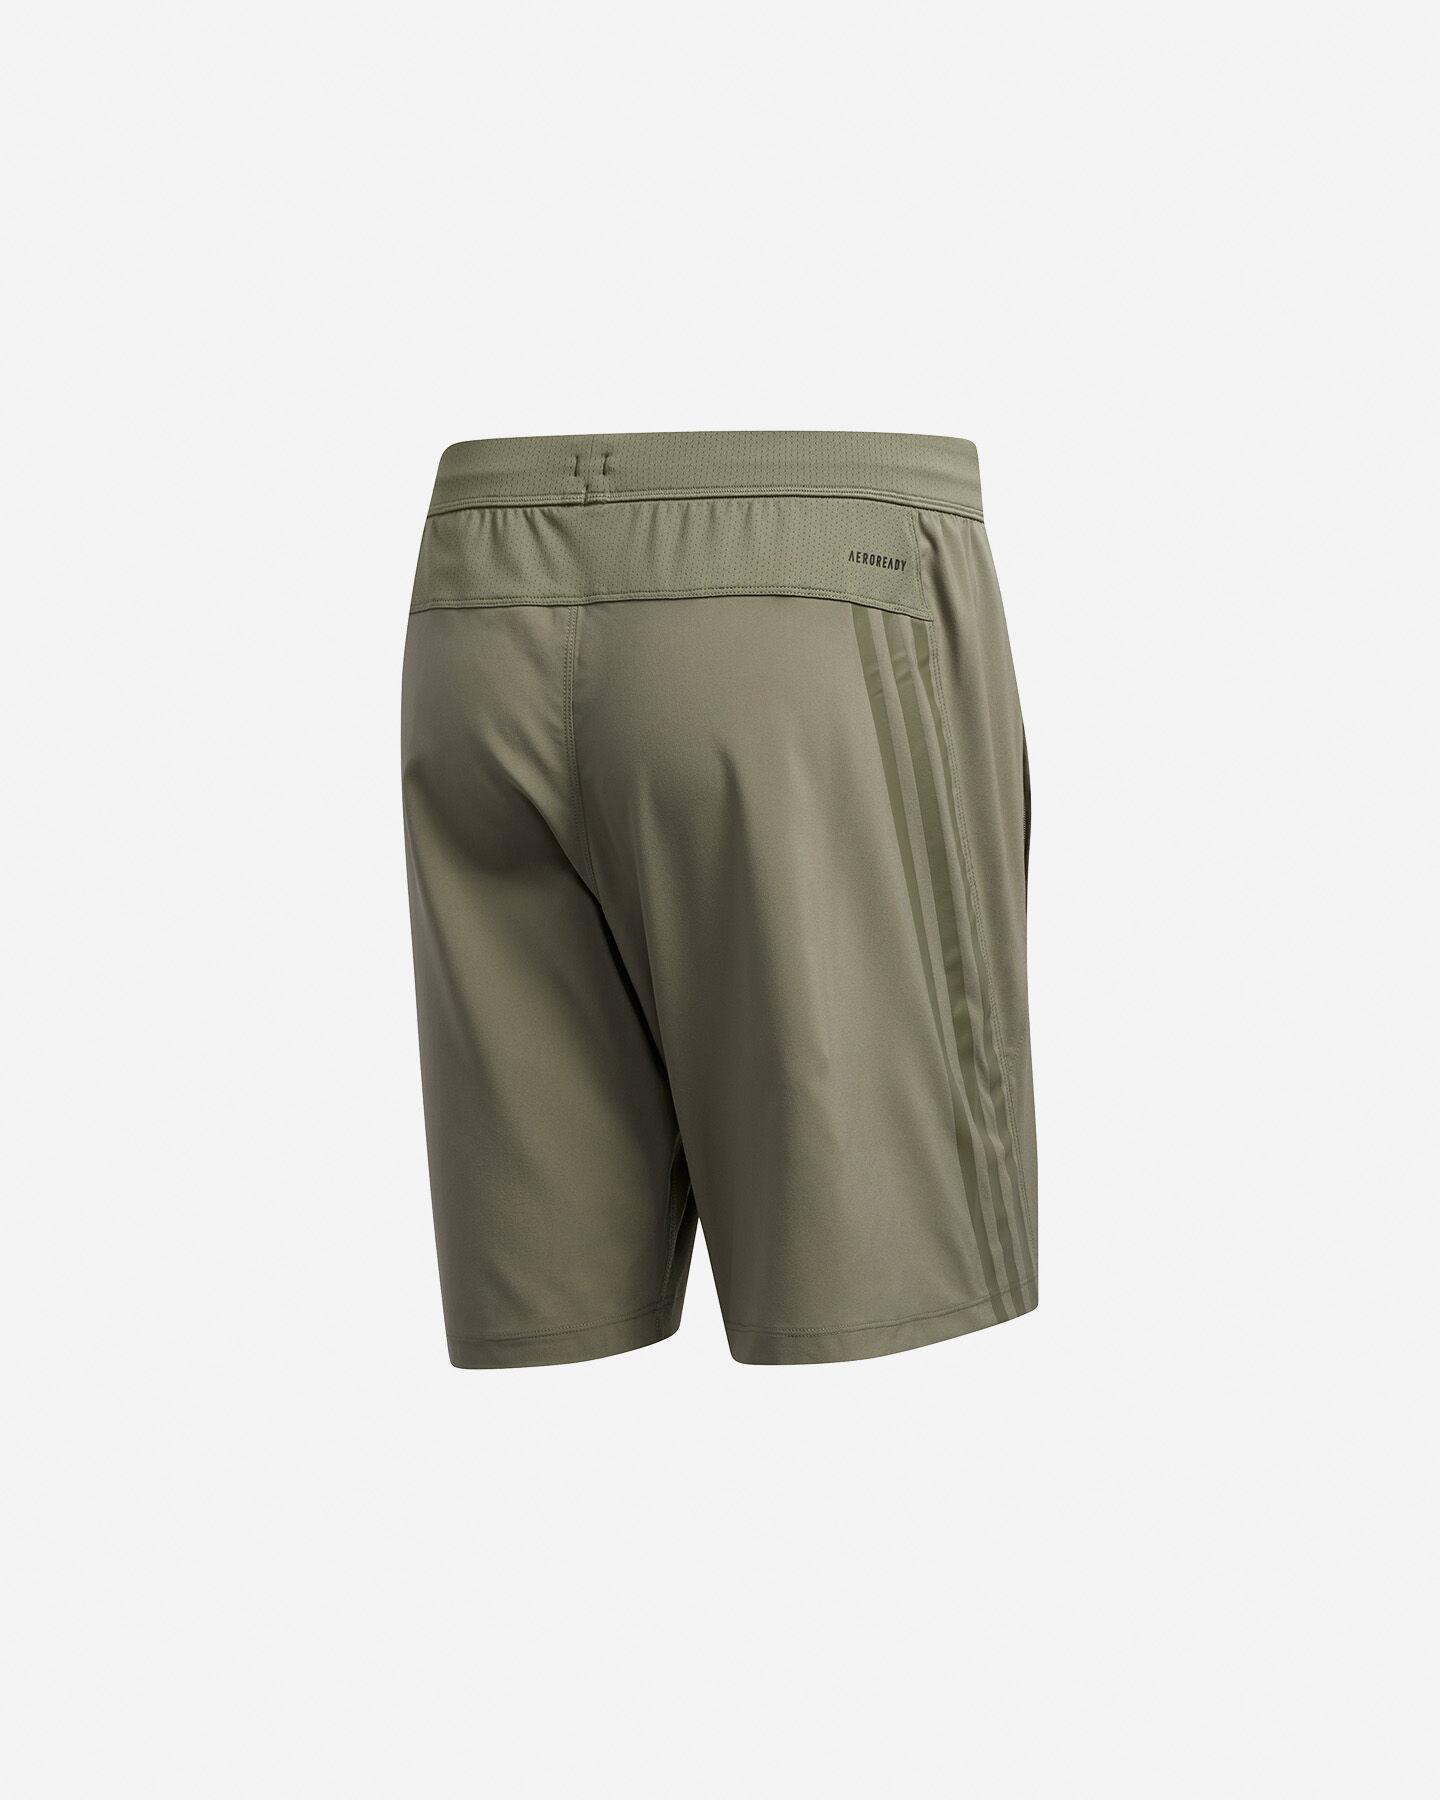 Pantalone training ADIDAS AEROREADY 3-STRIPES 8-INCH M S5154649 scatto 1